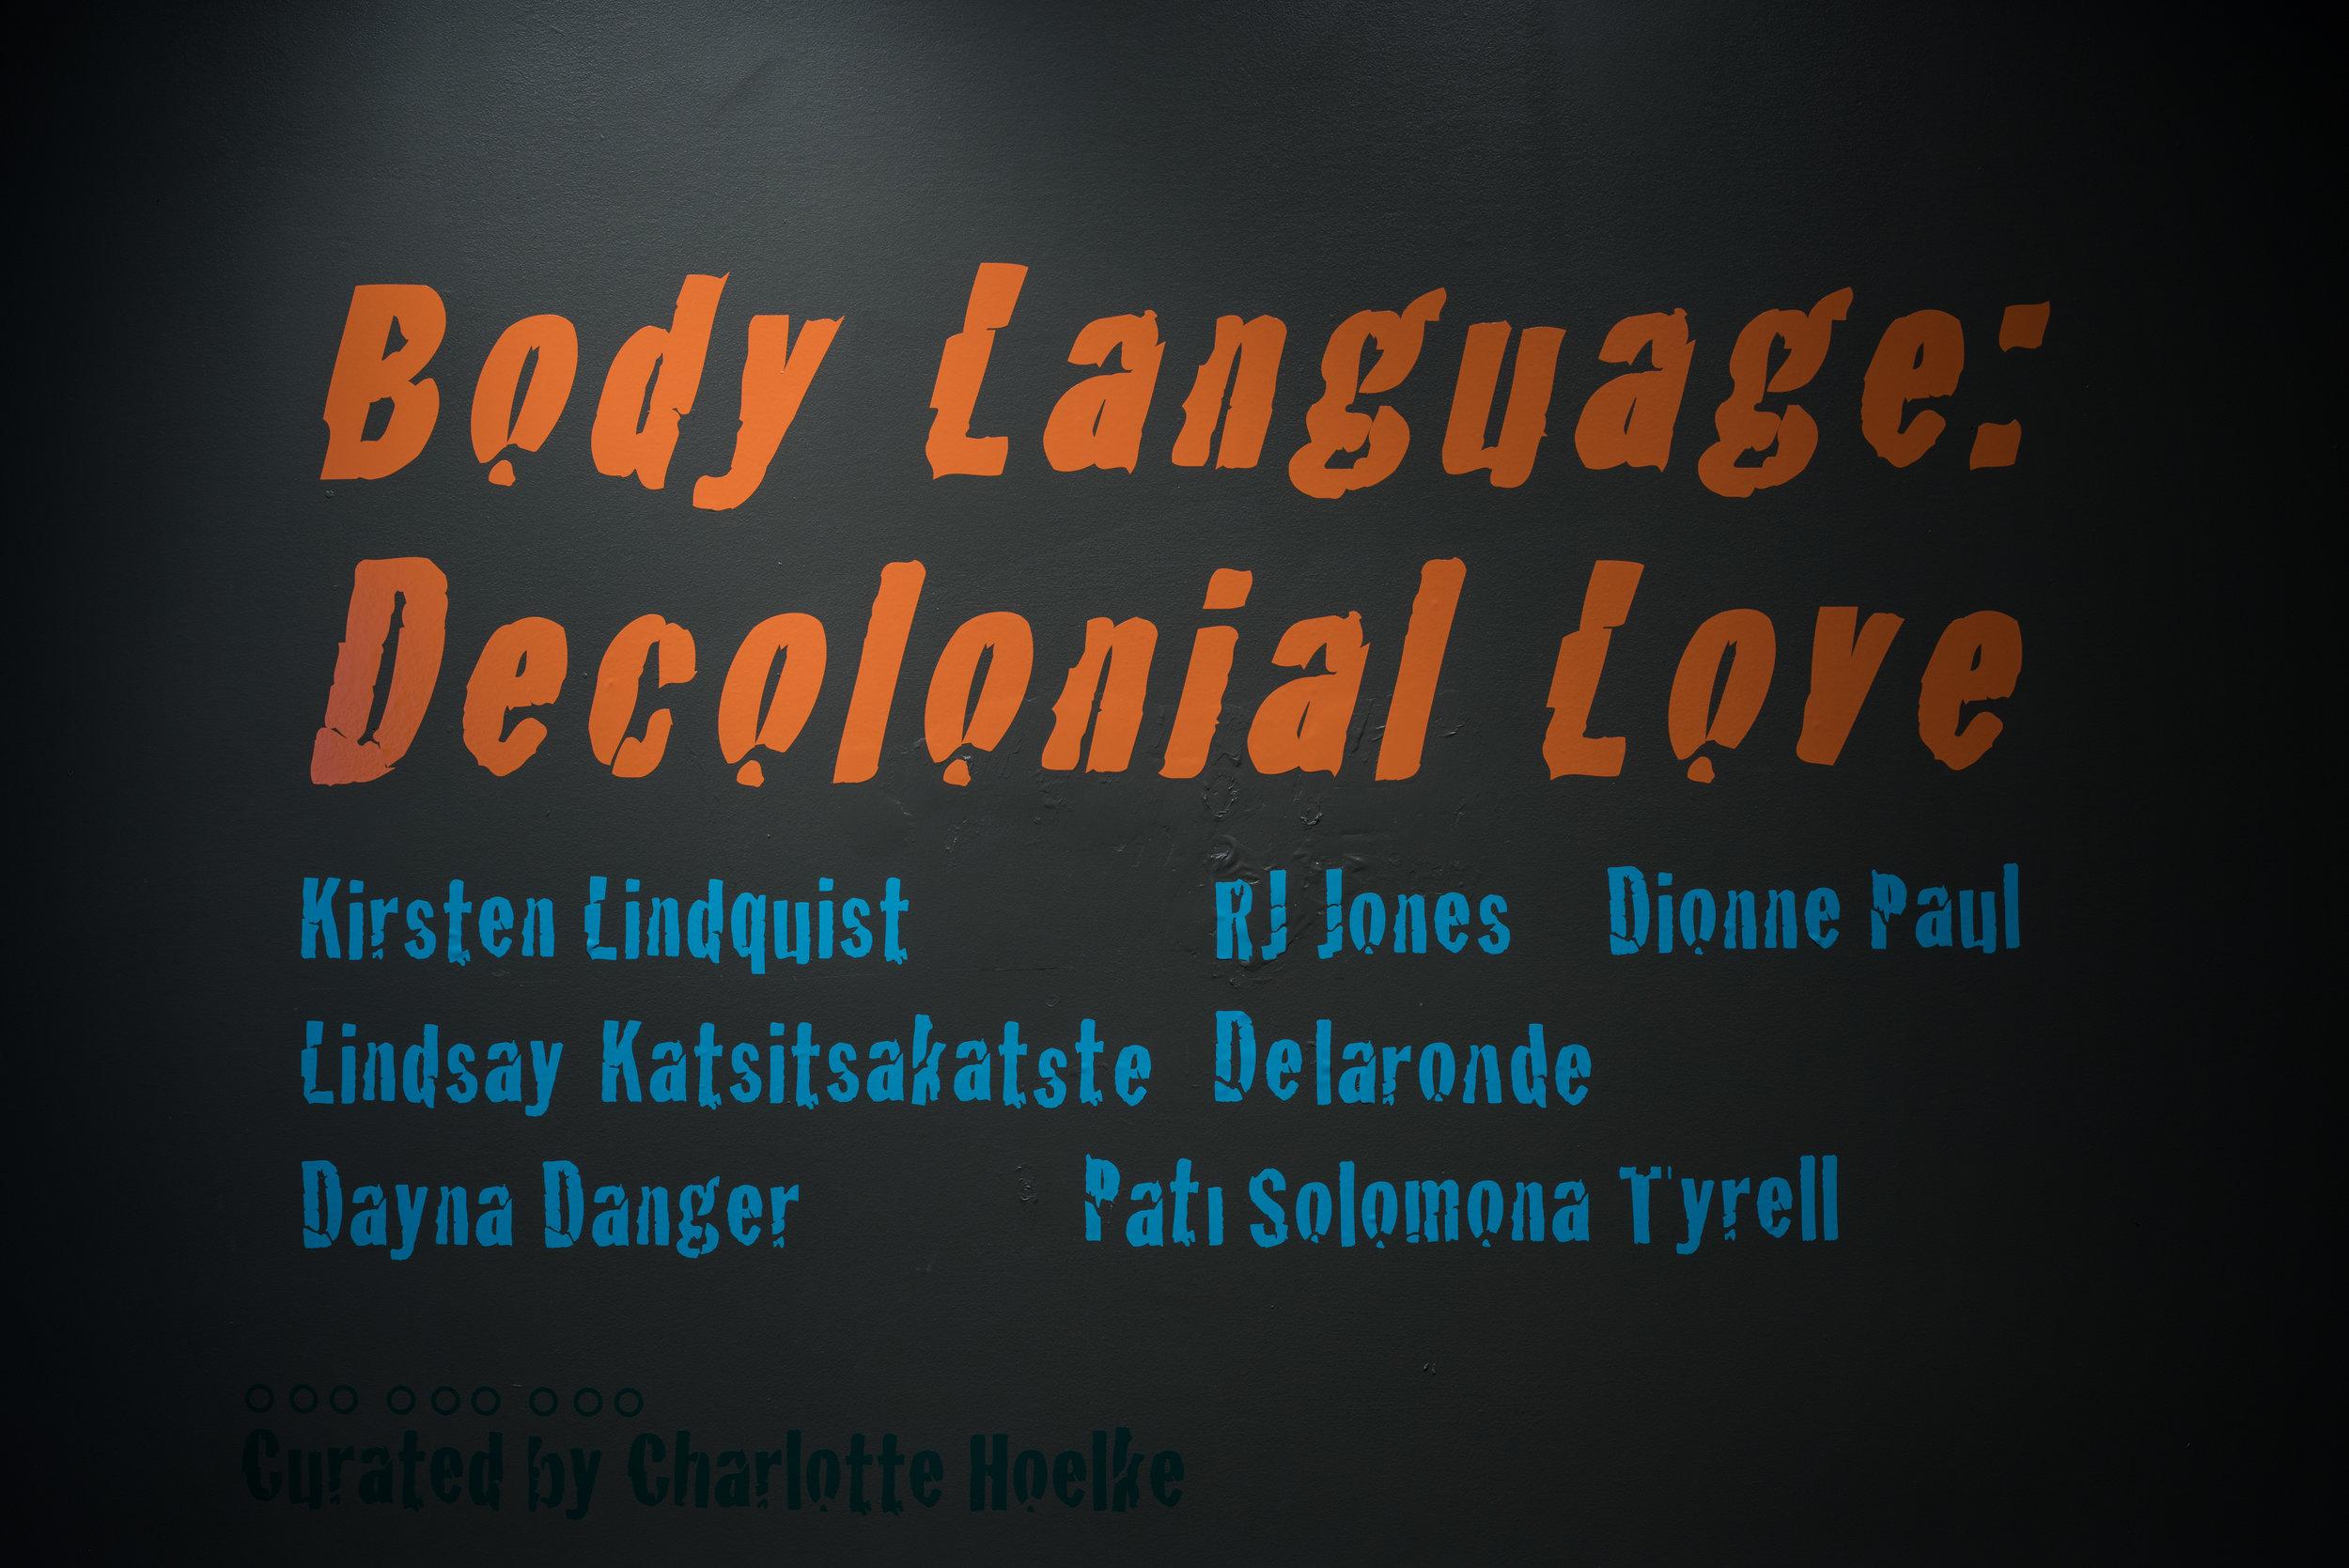 Body Language: Decolonial Love